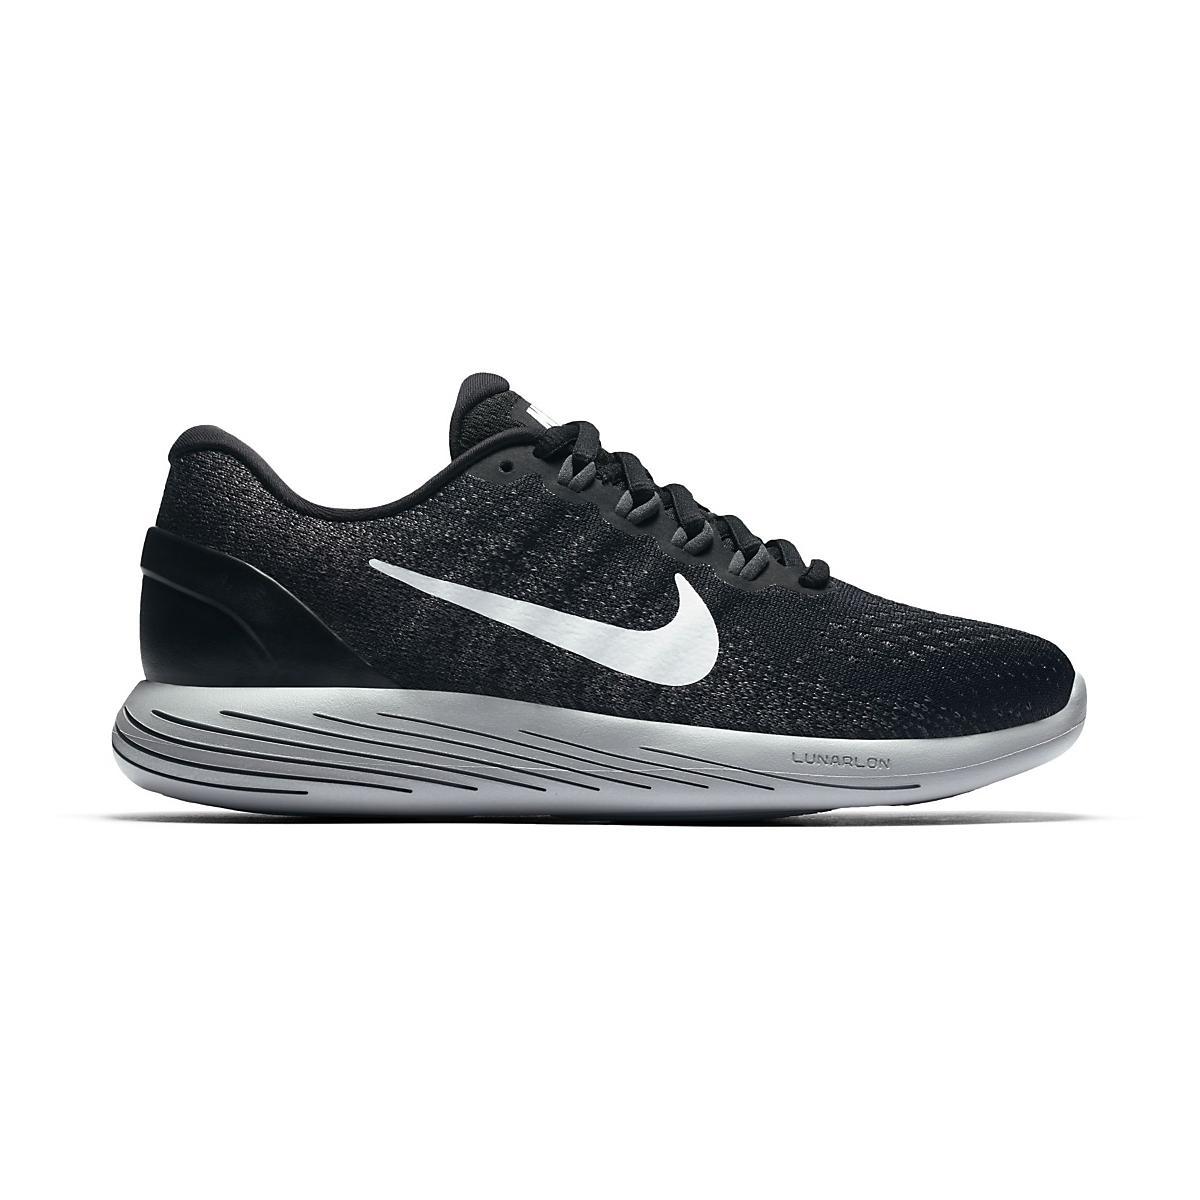 4345ccf91065 Womens Nike LunarGlide 9 Running Shoe at Road Runner Sports